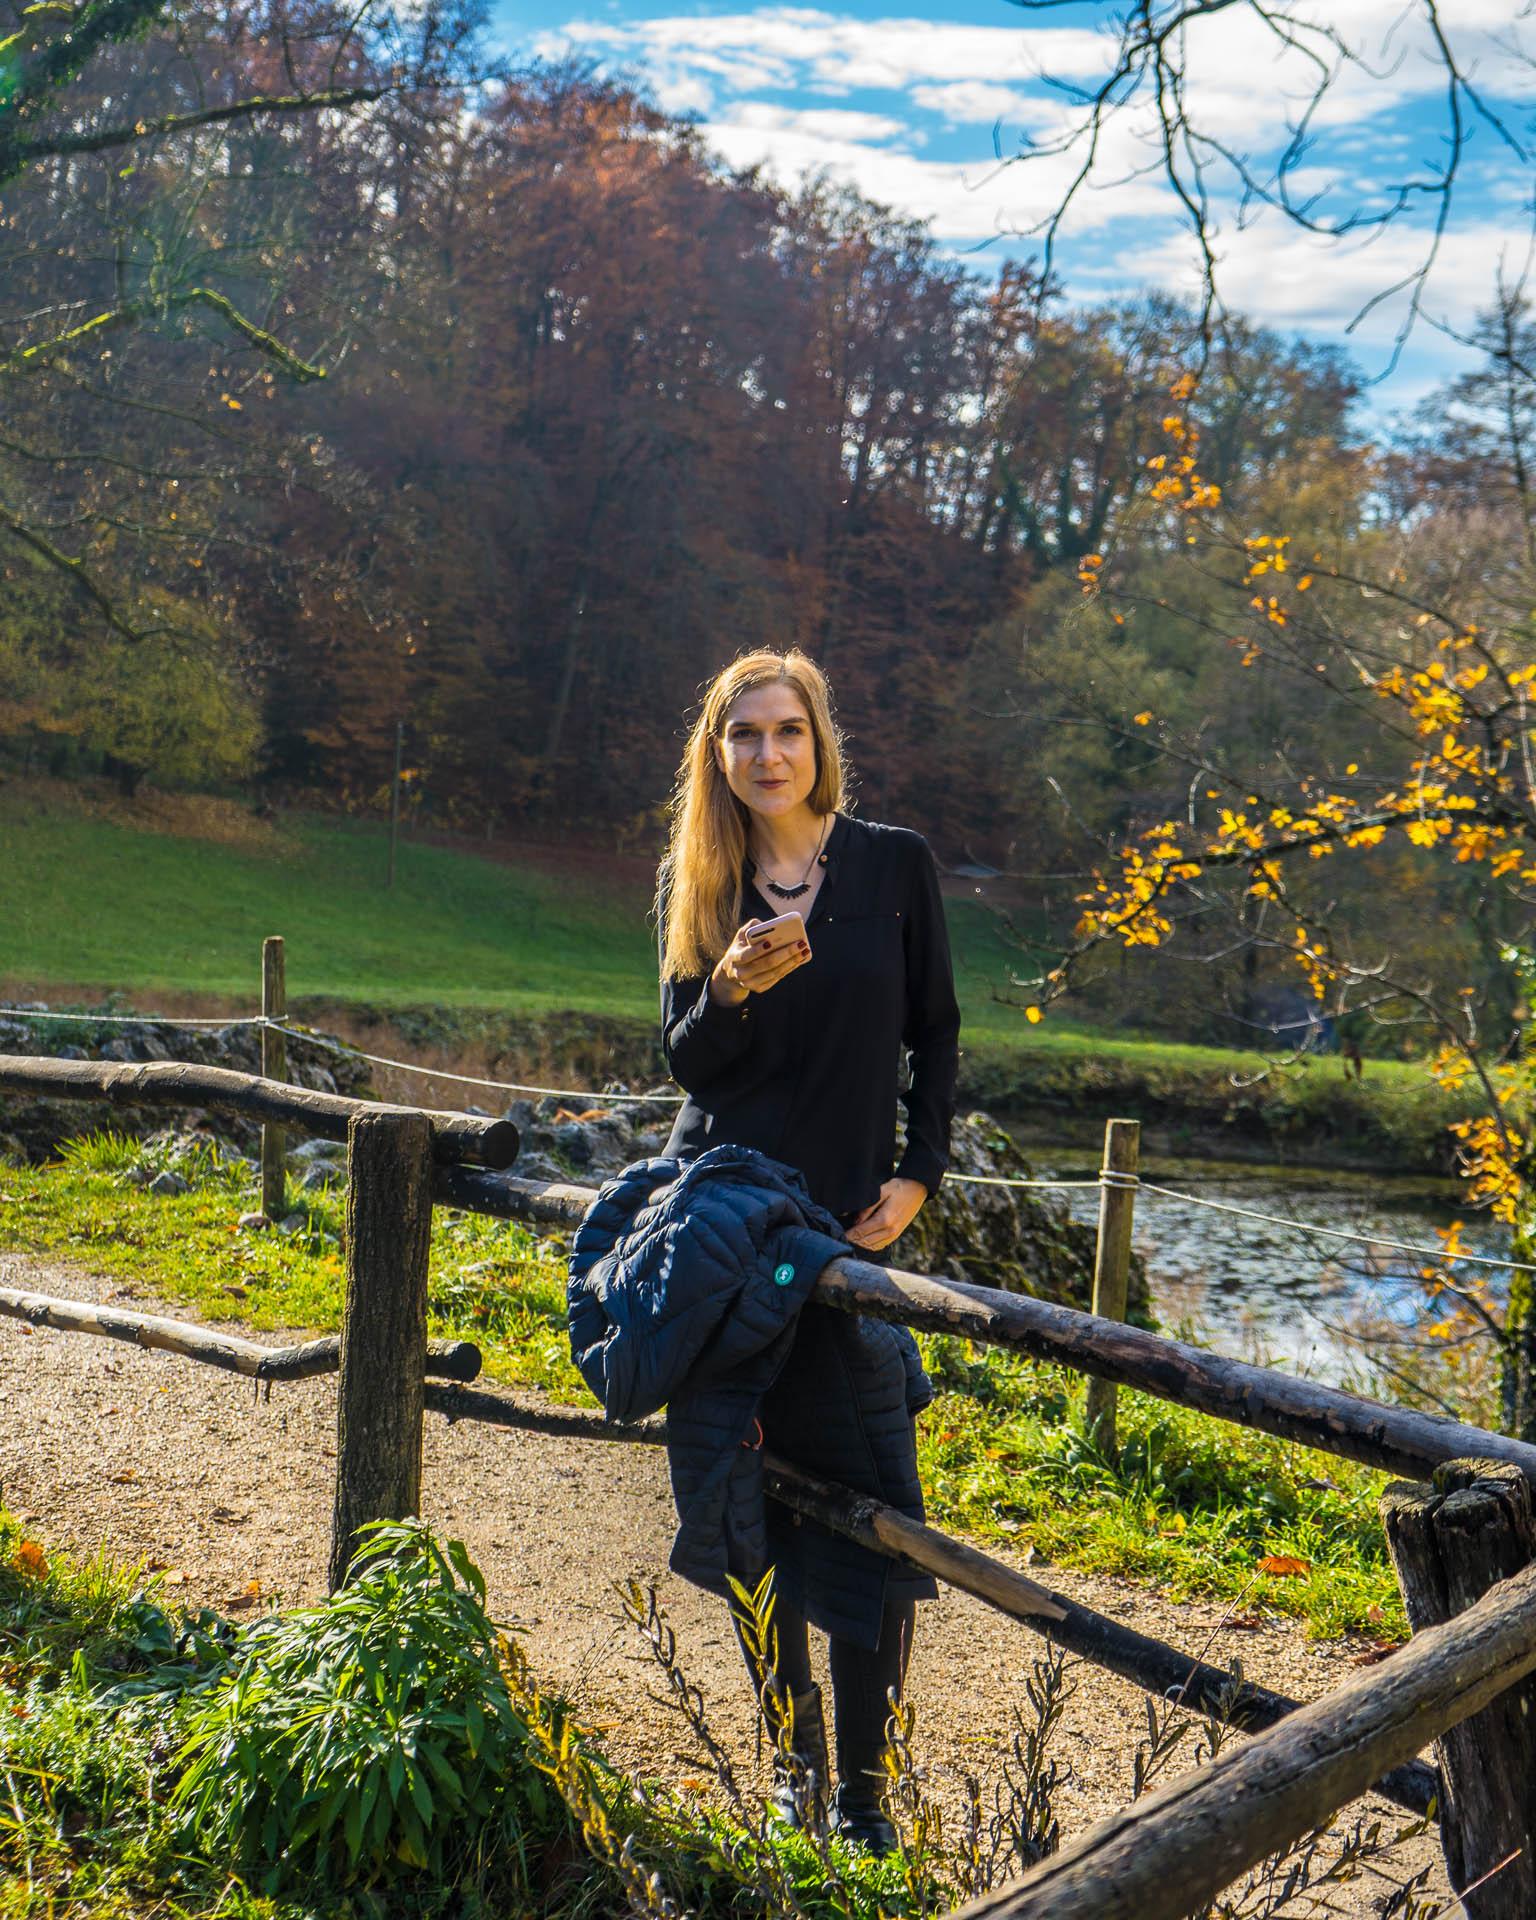 Doris Flury Foodblog Lifestyle Reisen